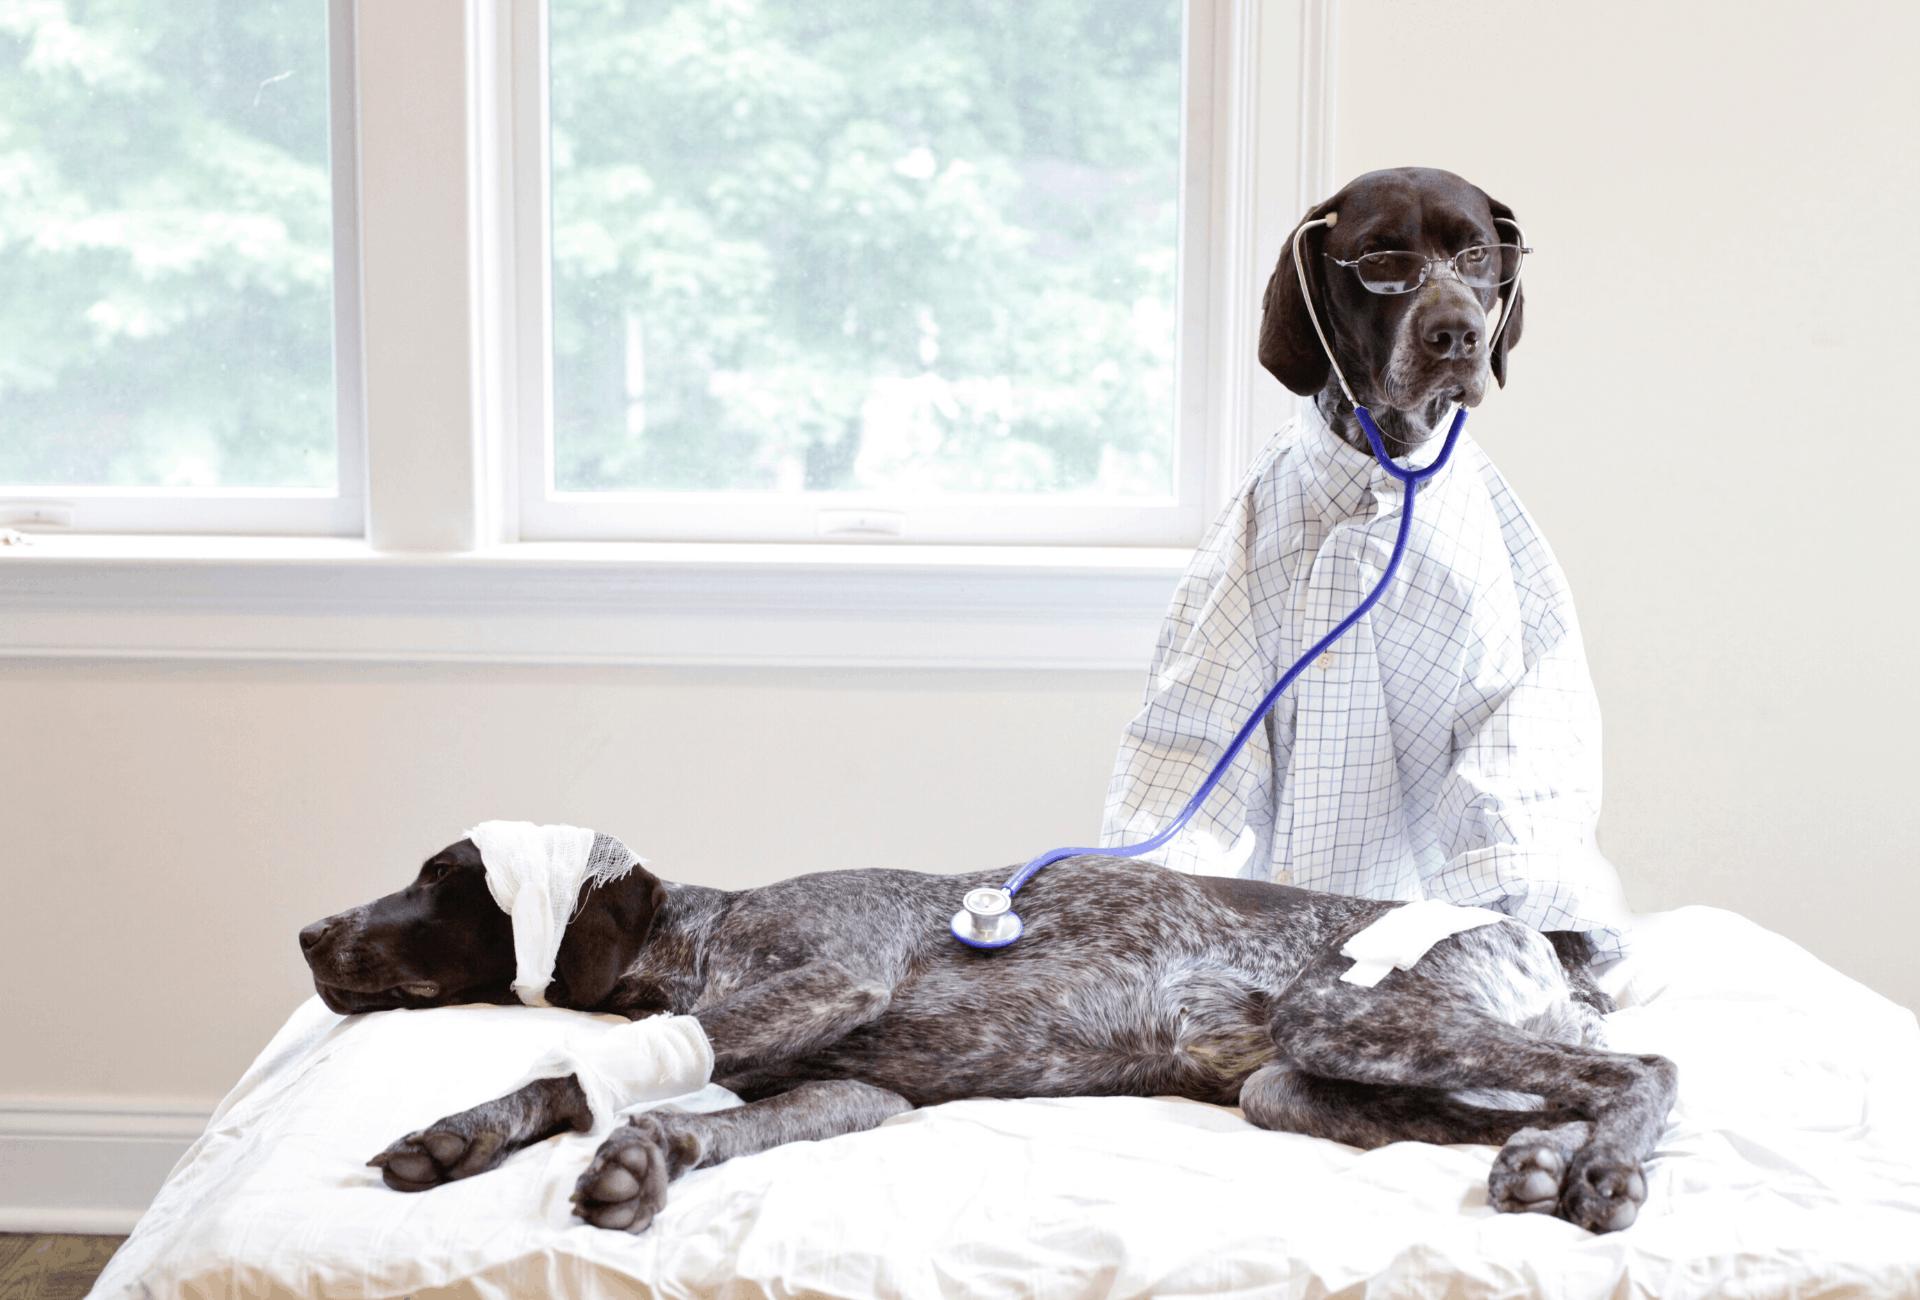 Dog diagnosing another dog.